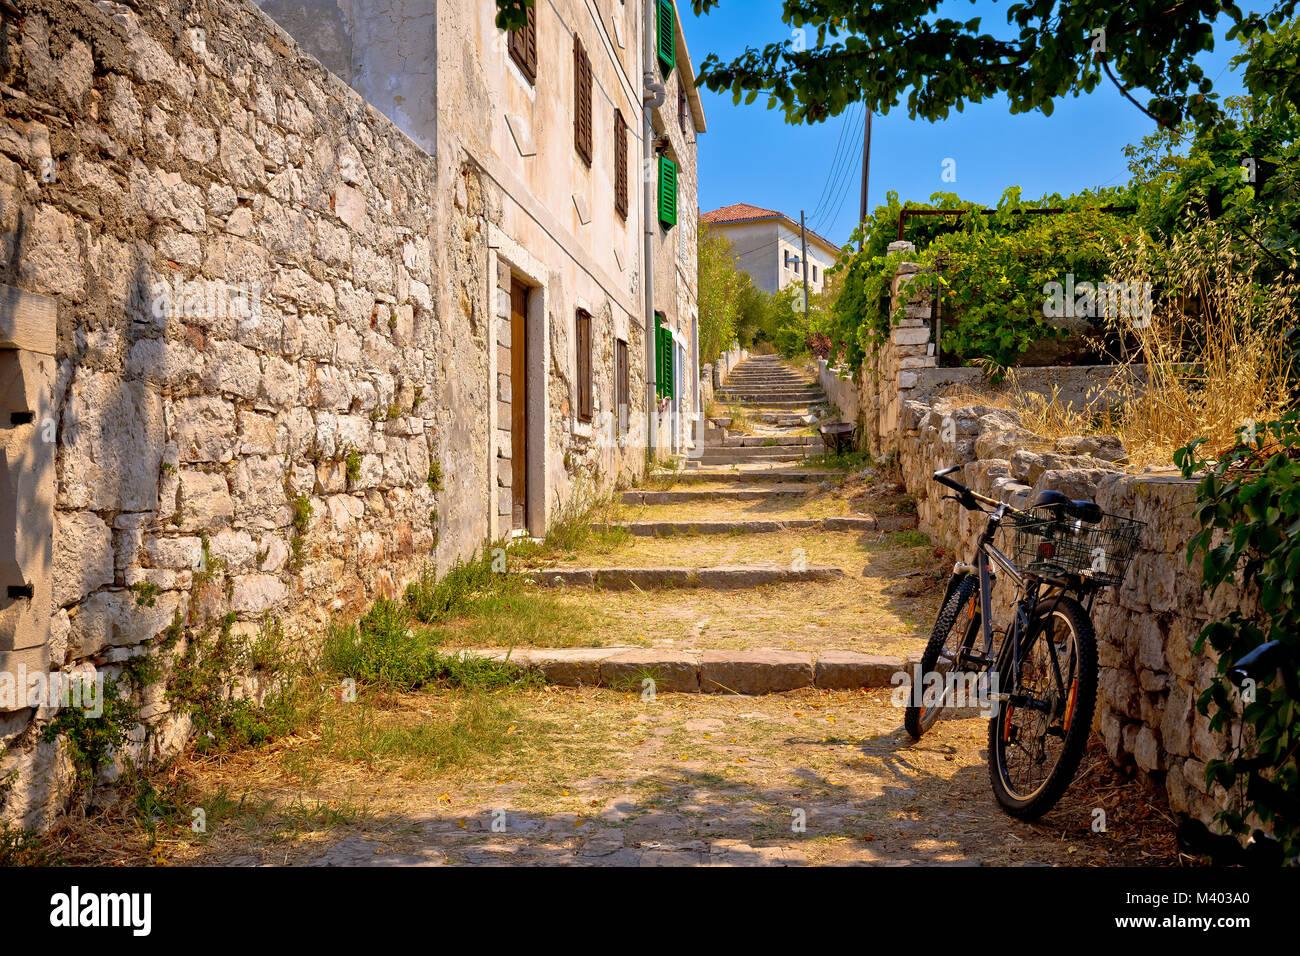 Old stone mediterranean village walkway on Prvic island, Dalmatia region of Croatia - Stock Image